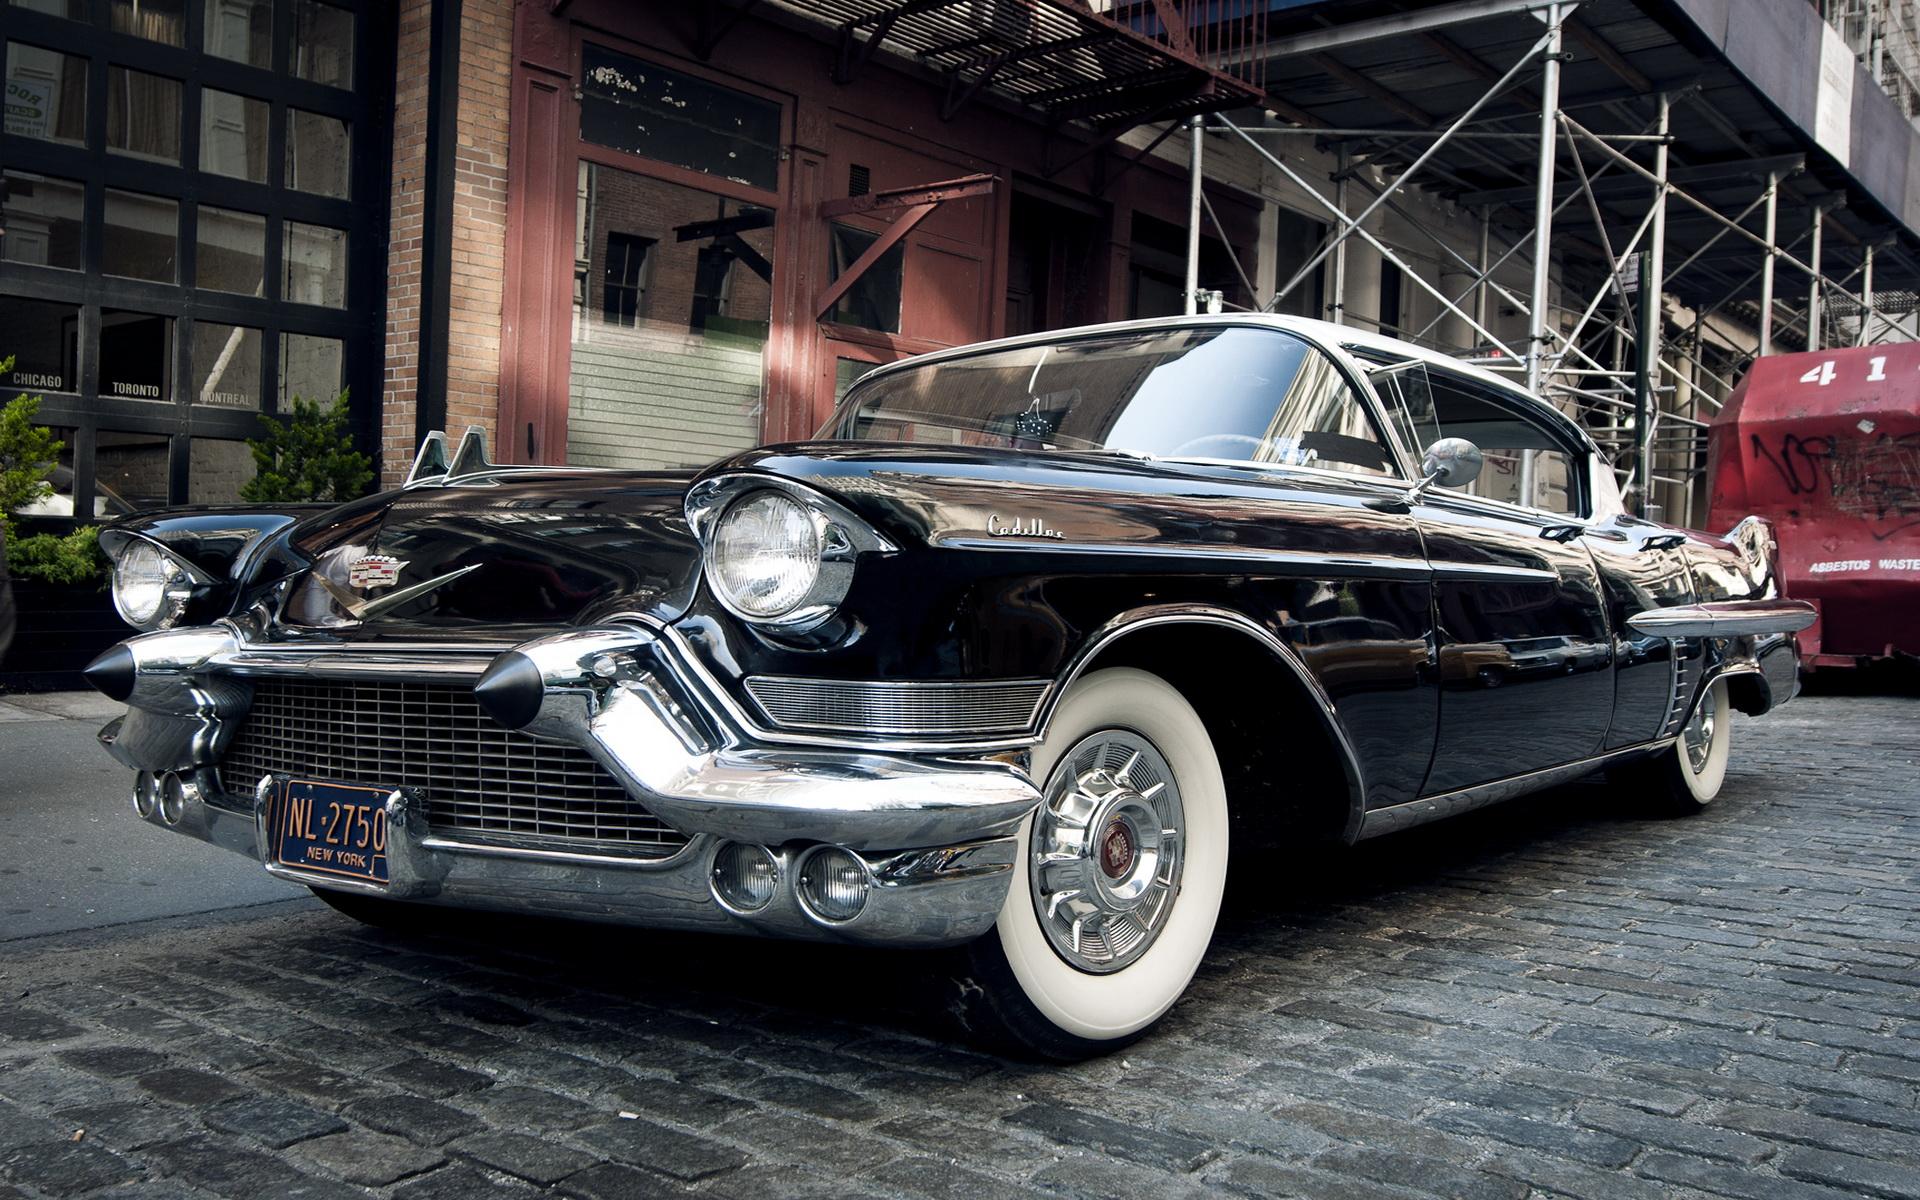 1957 Cadillac Sedan Full HD Wallpaper And Background Image